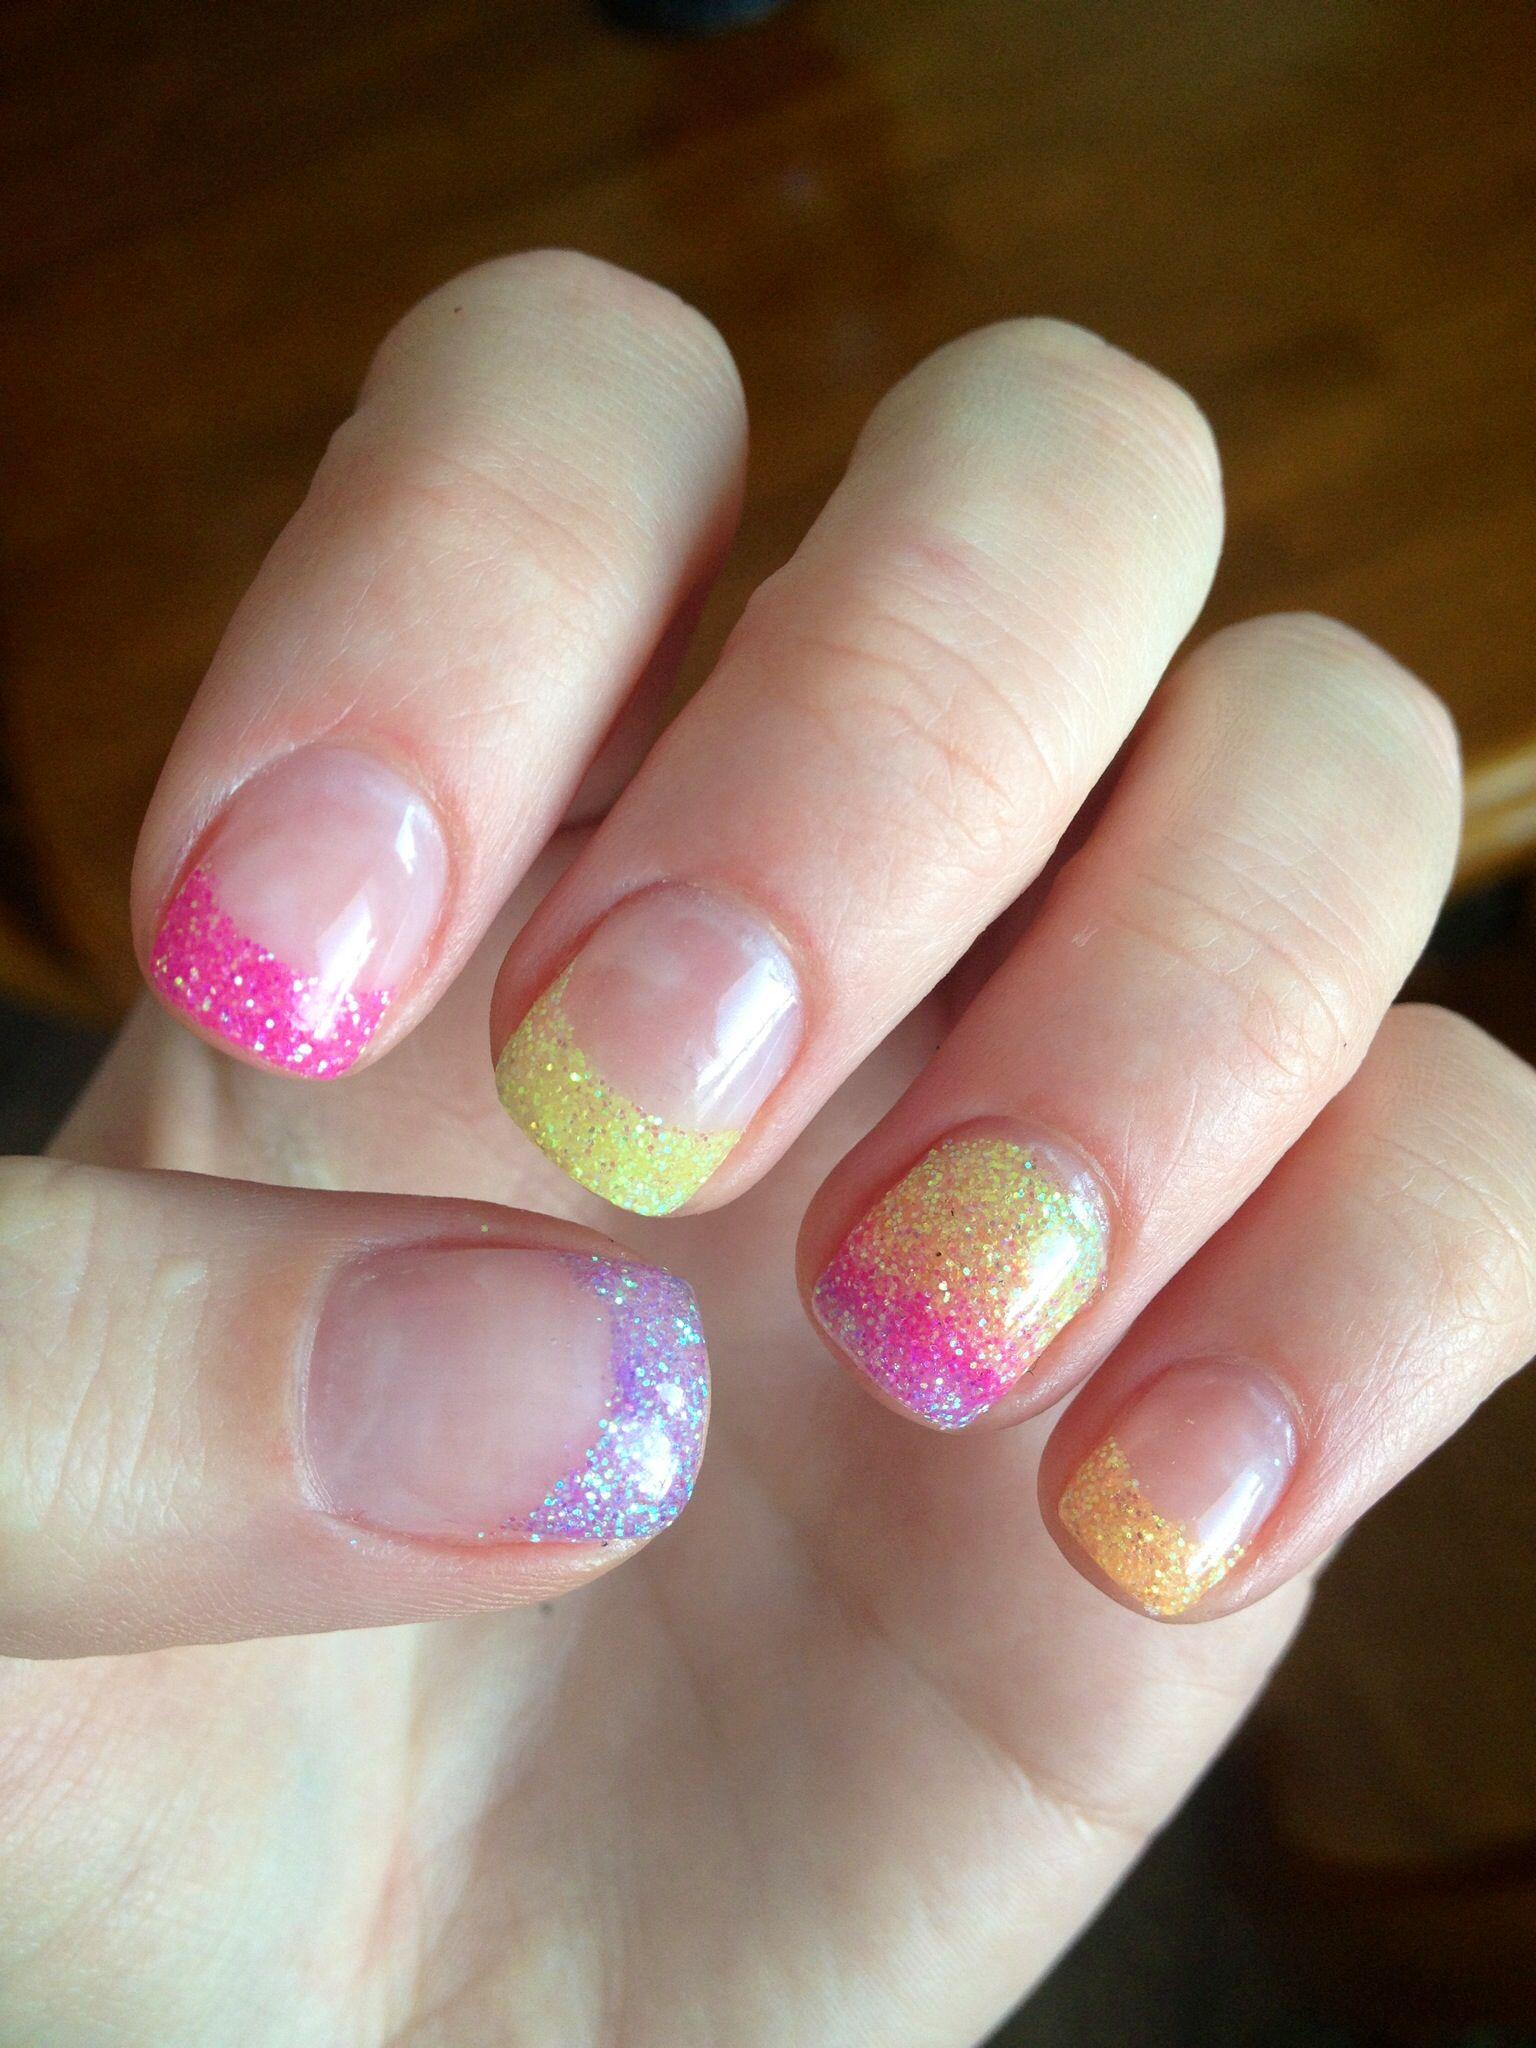 Neon Rainbow Gel Nails Gel Nail Designs Nails Gel Nails